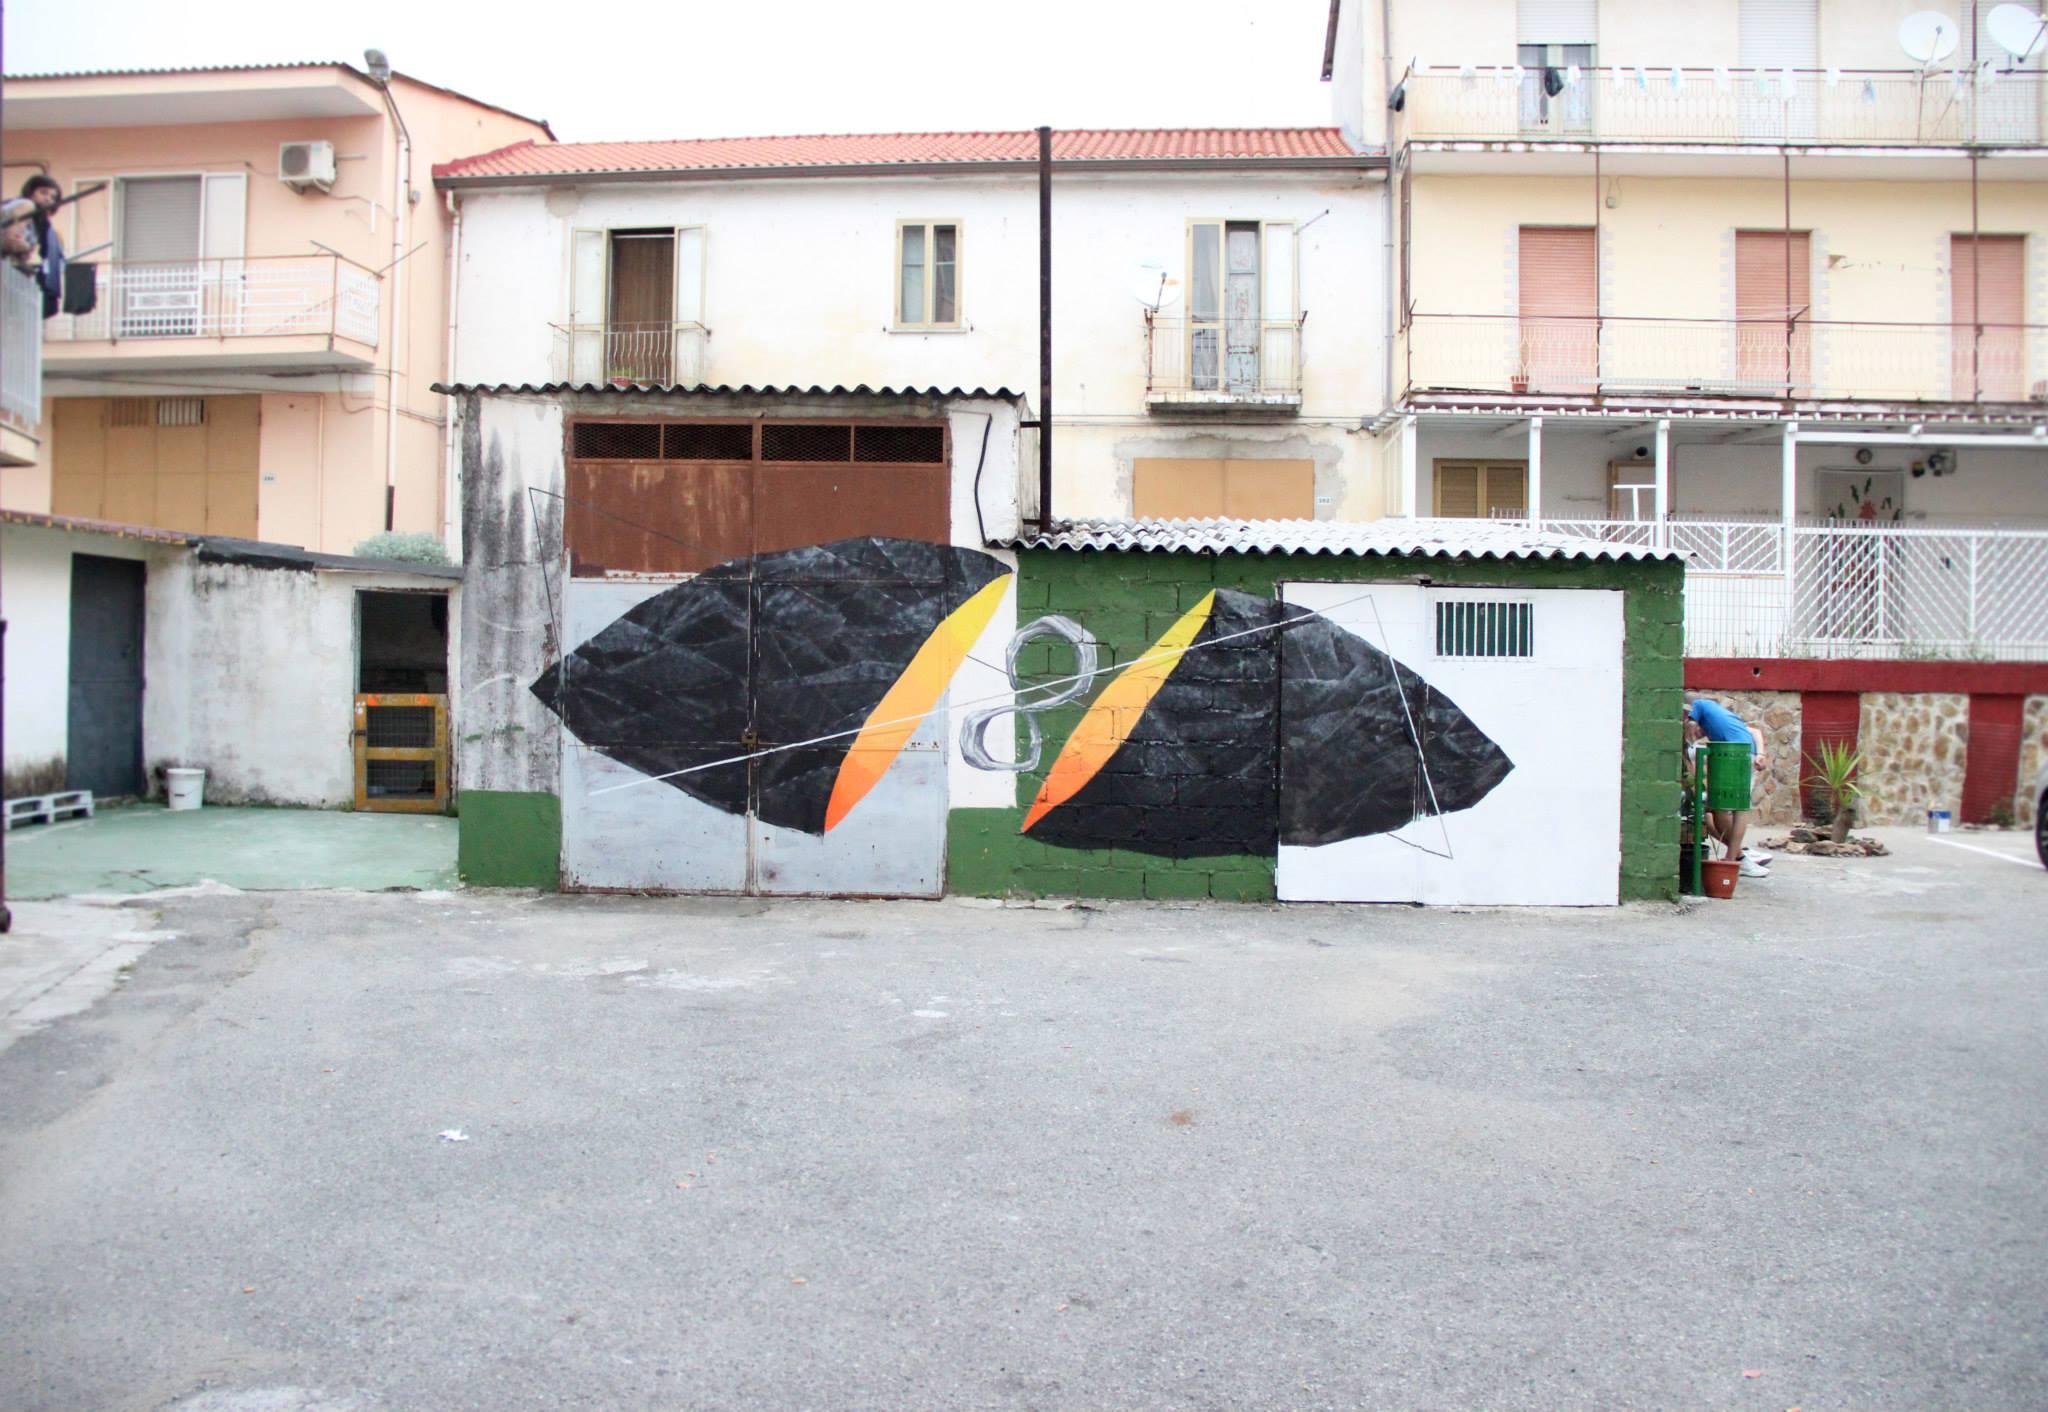 g-loois-new-murals-in-lamezia-terme-04